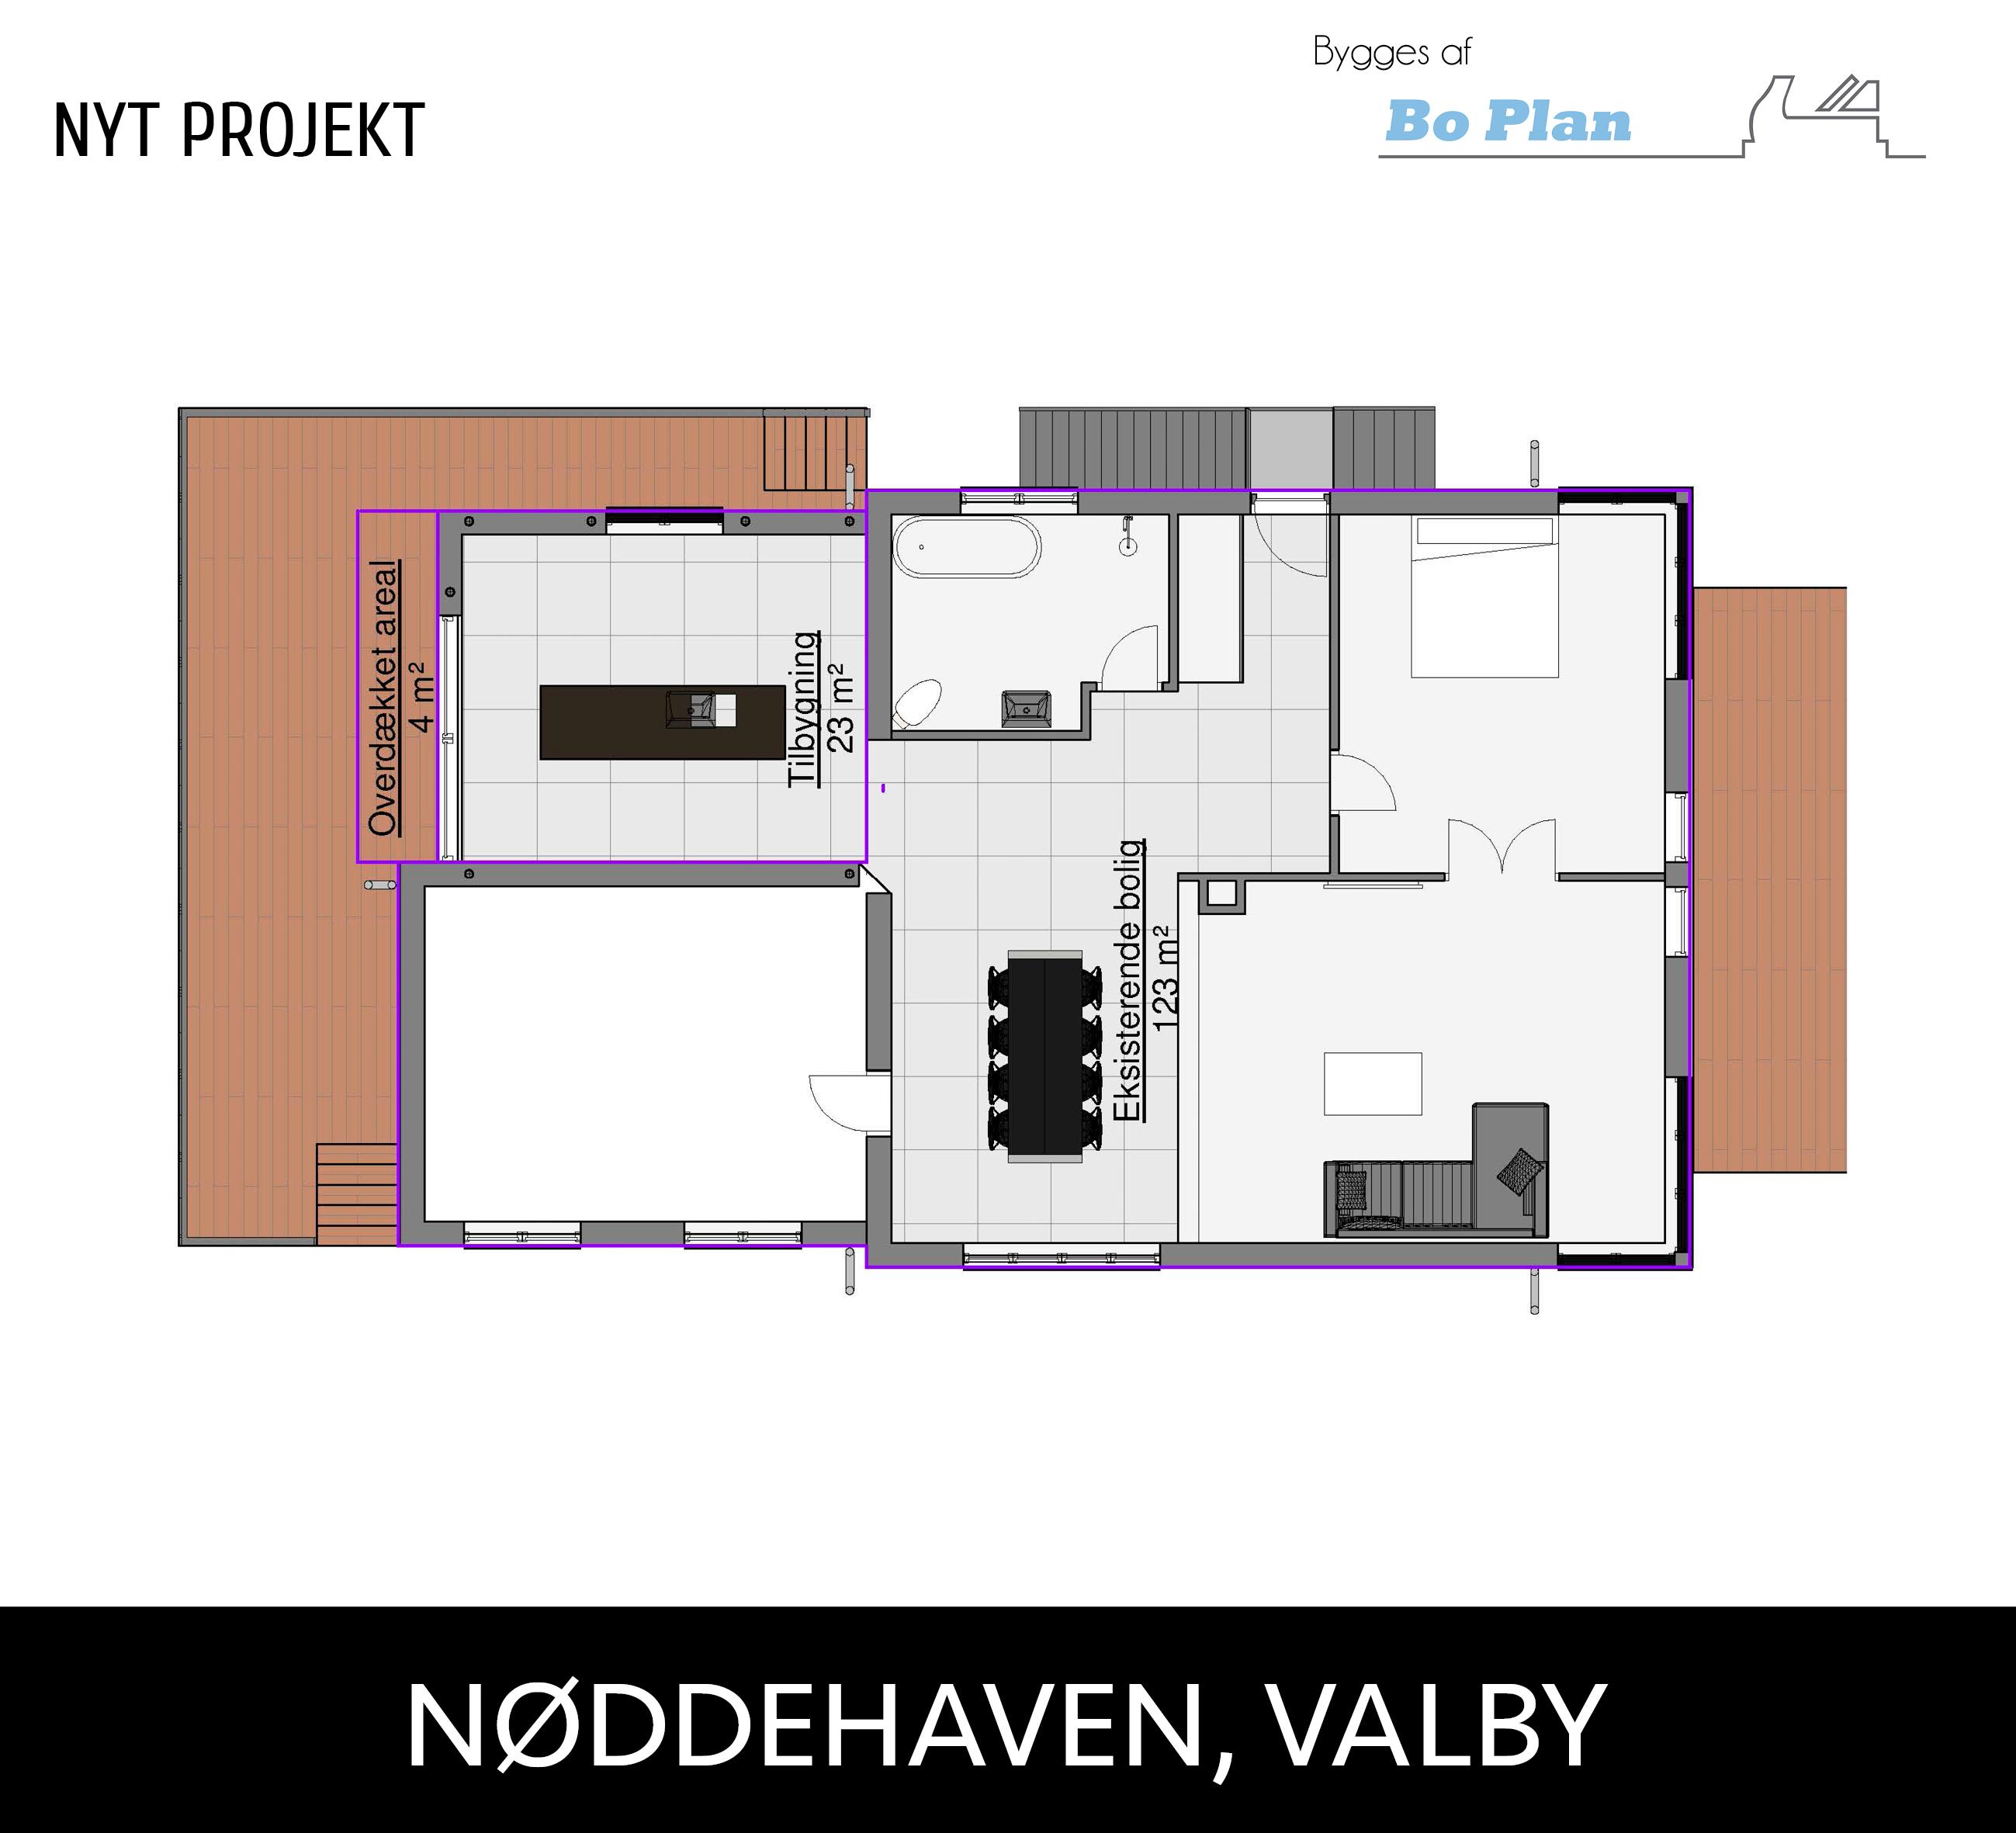 Nøddehaven, Valby2